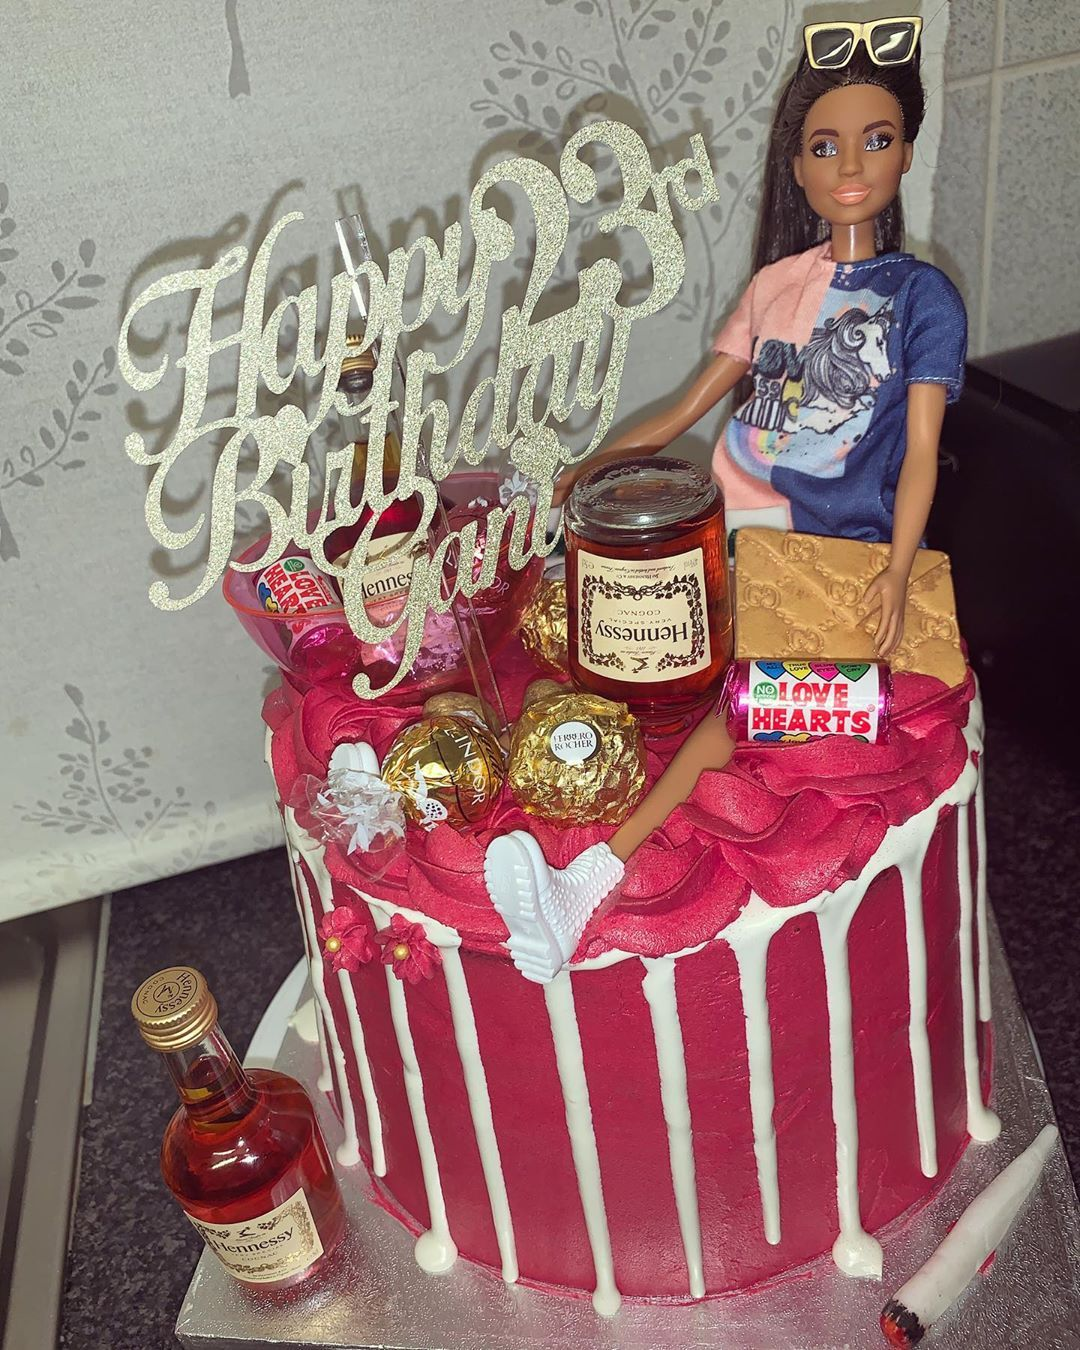 ✔pictame webstagram 🔥🔥🔥 Instagram post by @lavishcakesx | Barbie living her best life 😝💁🏽♀️ • • | 🔥GPLUSE.CLUB